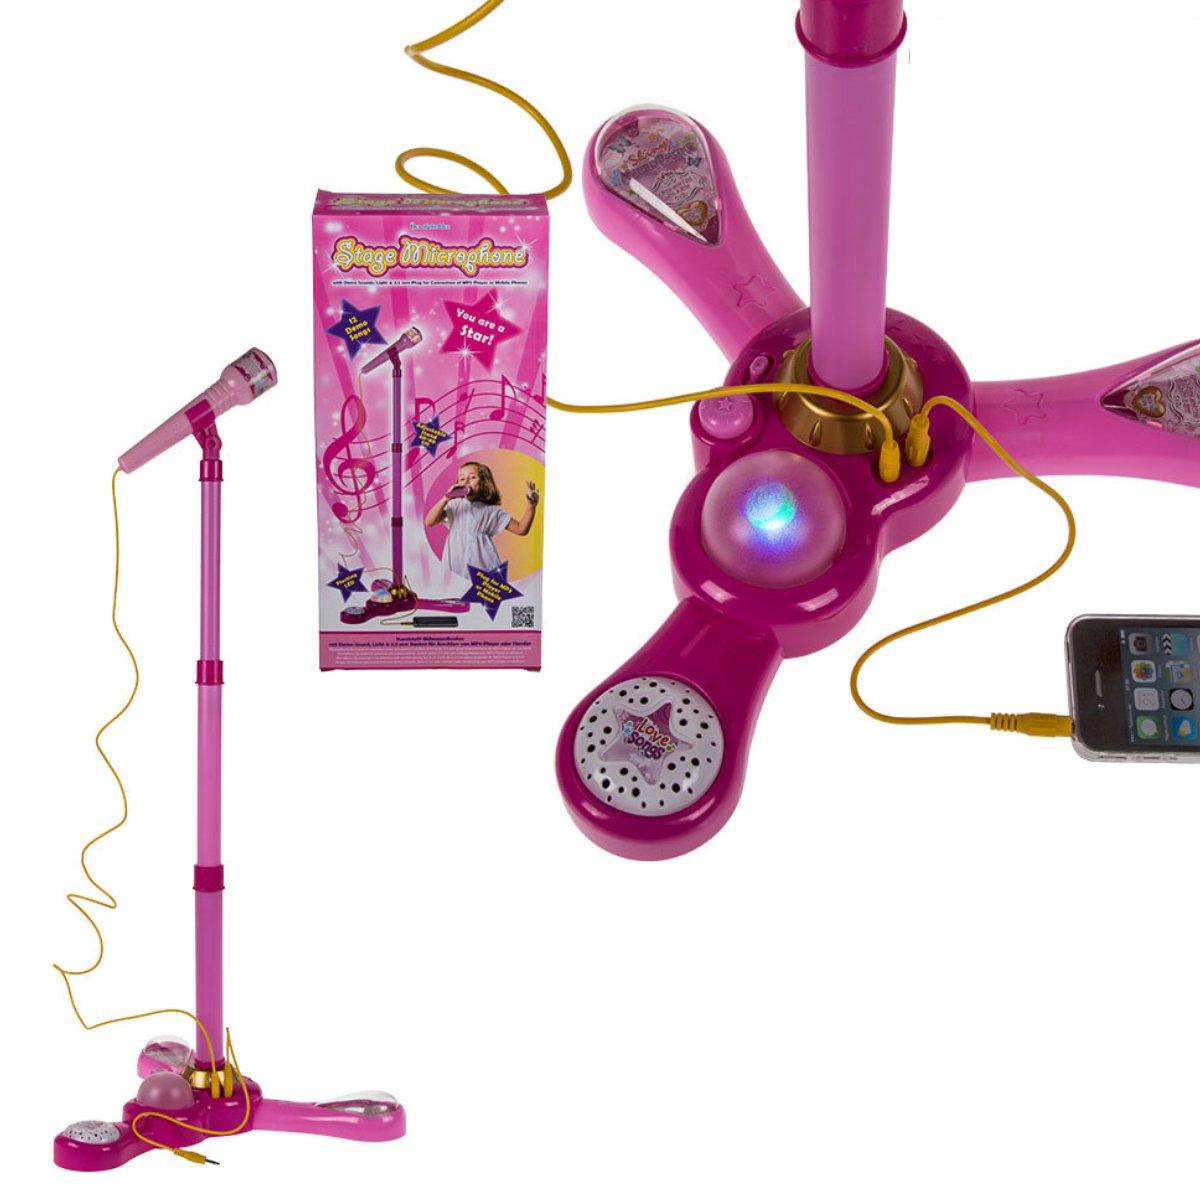 pinkes mikrofon mit st nder f r kinder aux anschluss. Black Bedroom Furniture Sets. Home Design Ideas